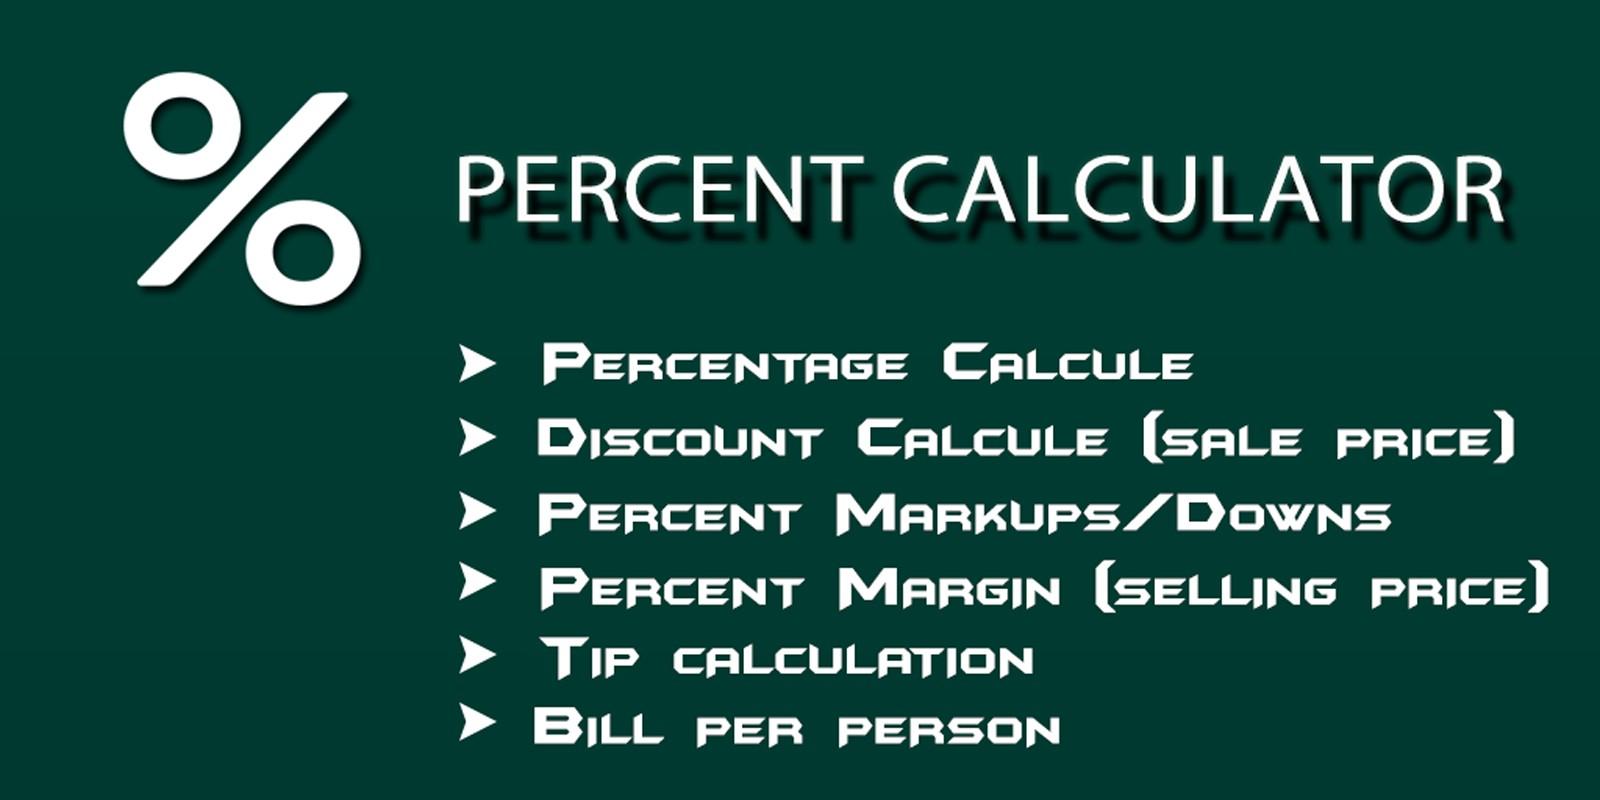 Percent Calculator - Android App Source Code